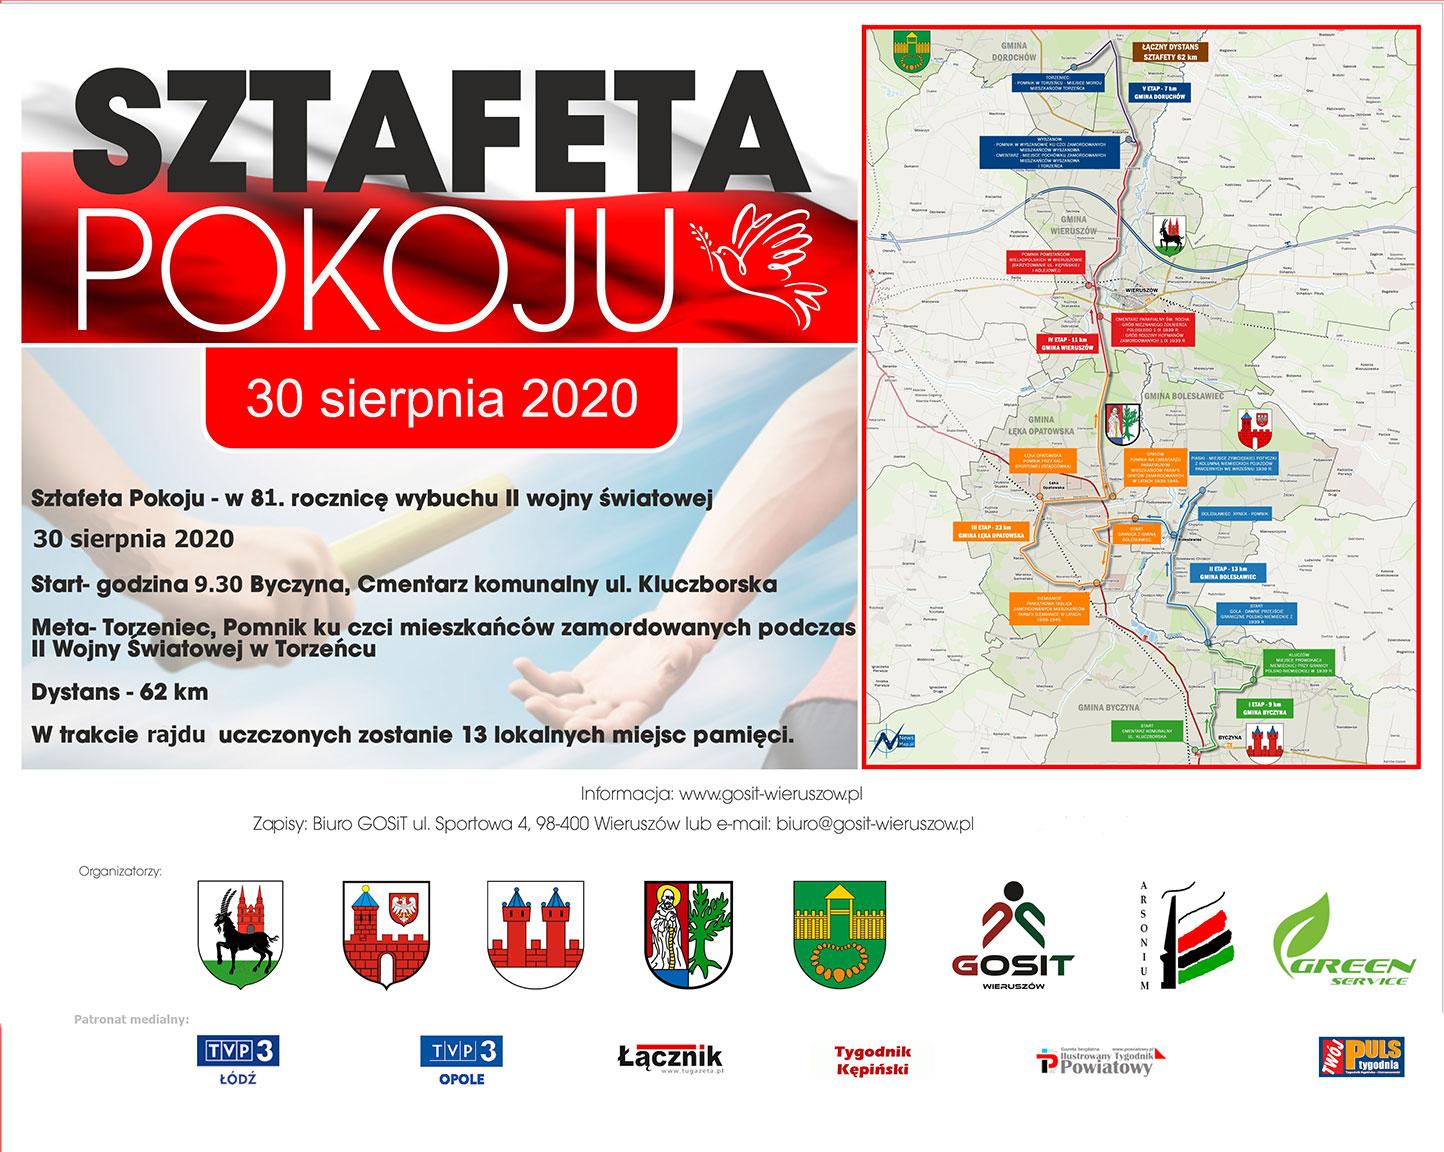 Sztafeta Pokoju 2020